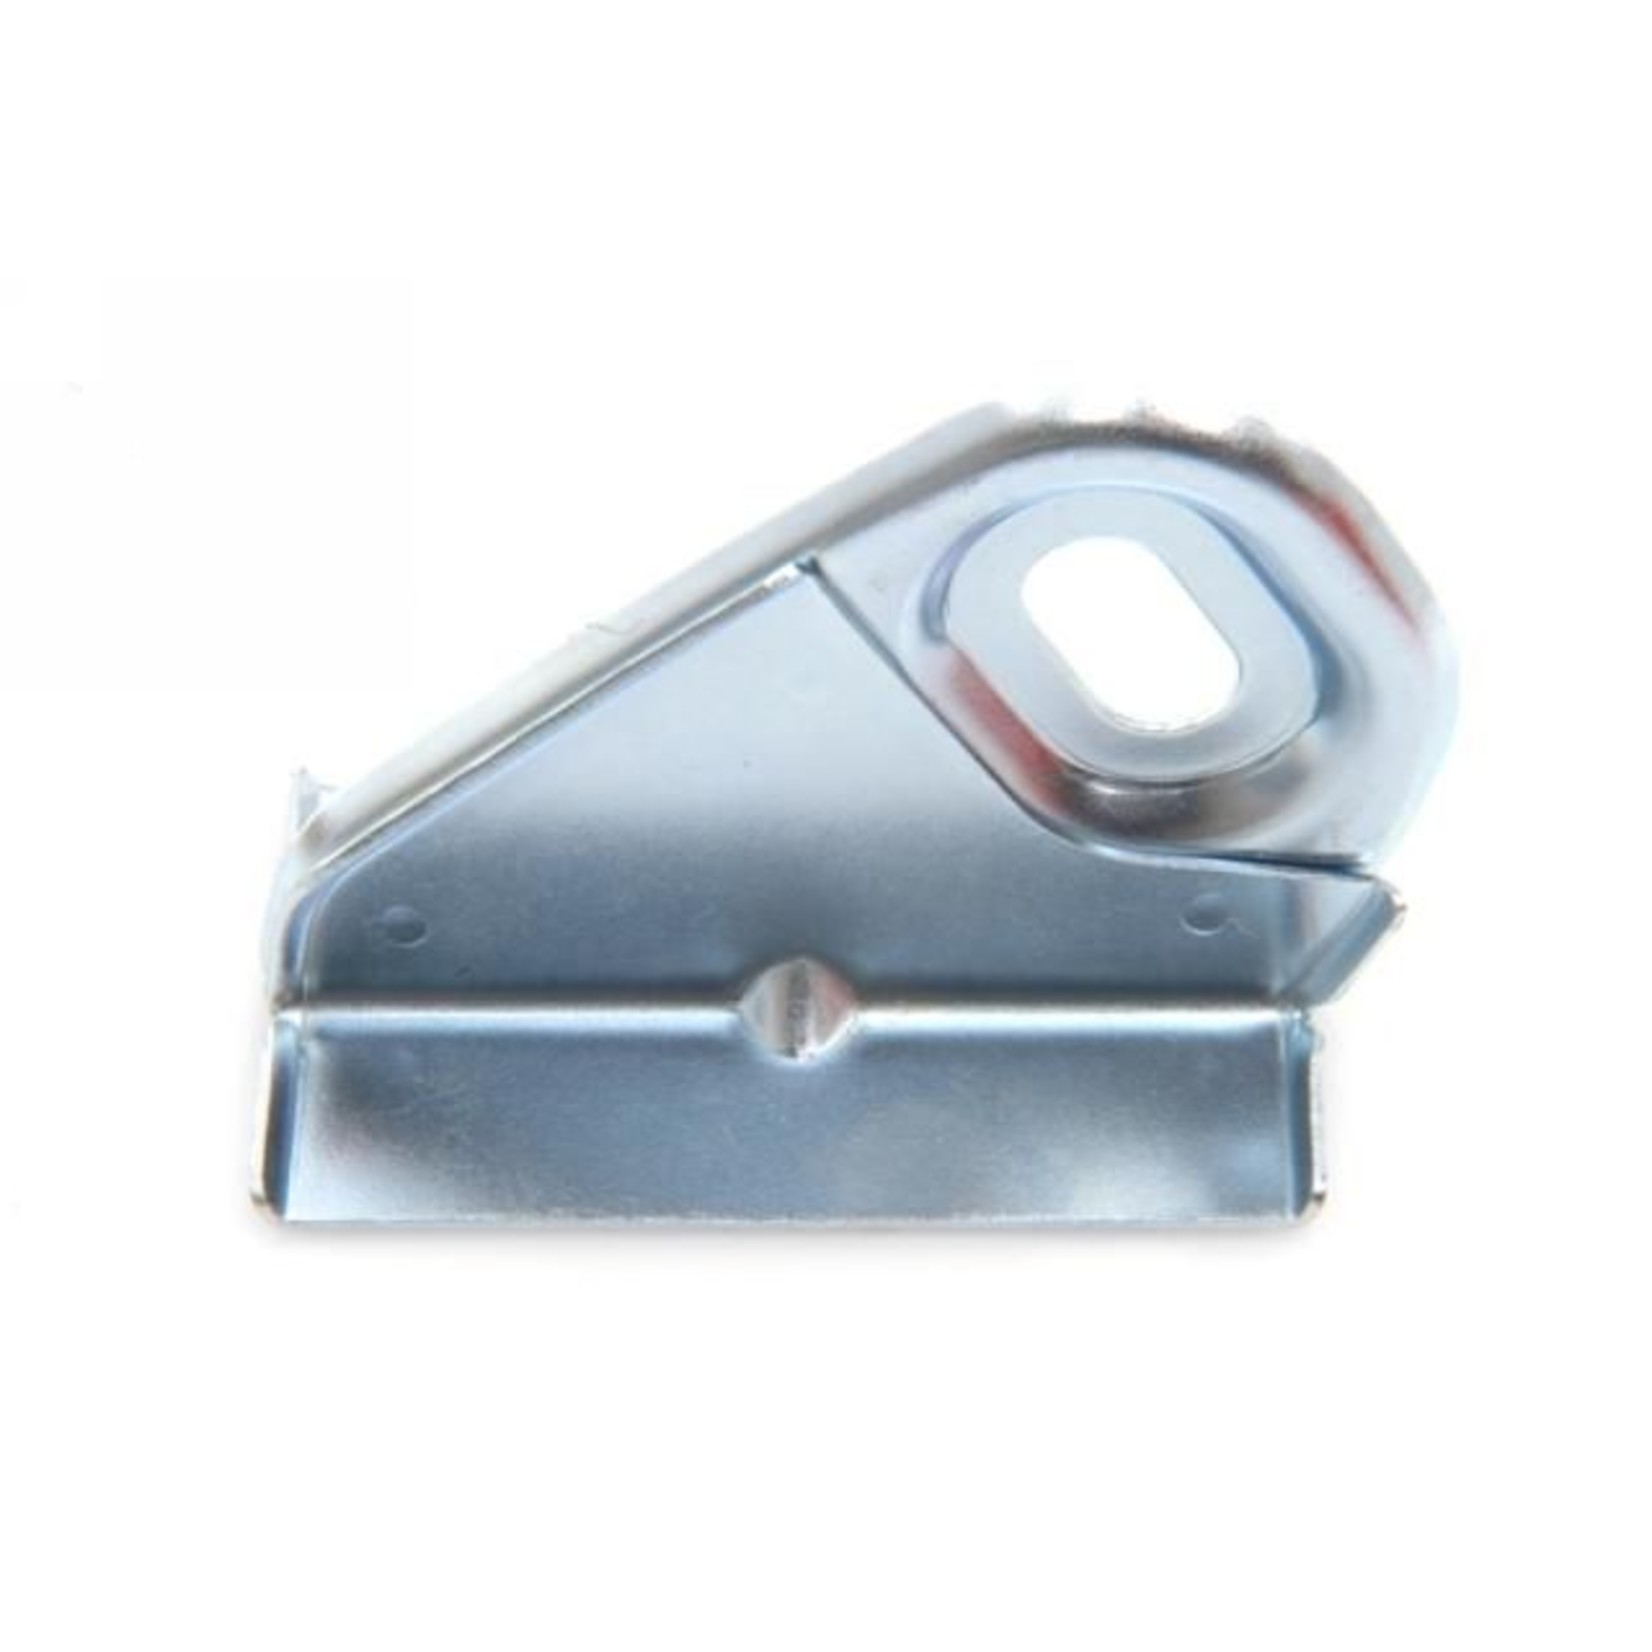 Panel de reparación aleta - parachoque derecha Nr Org: 5425982